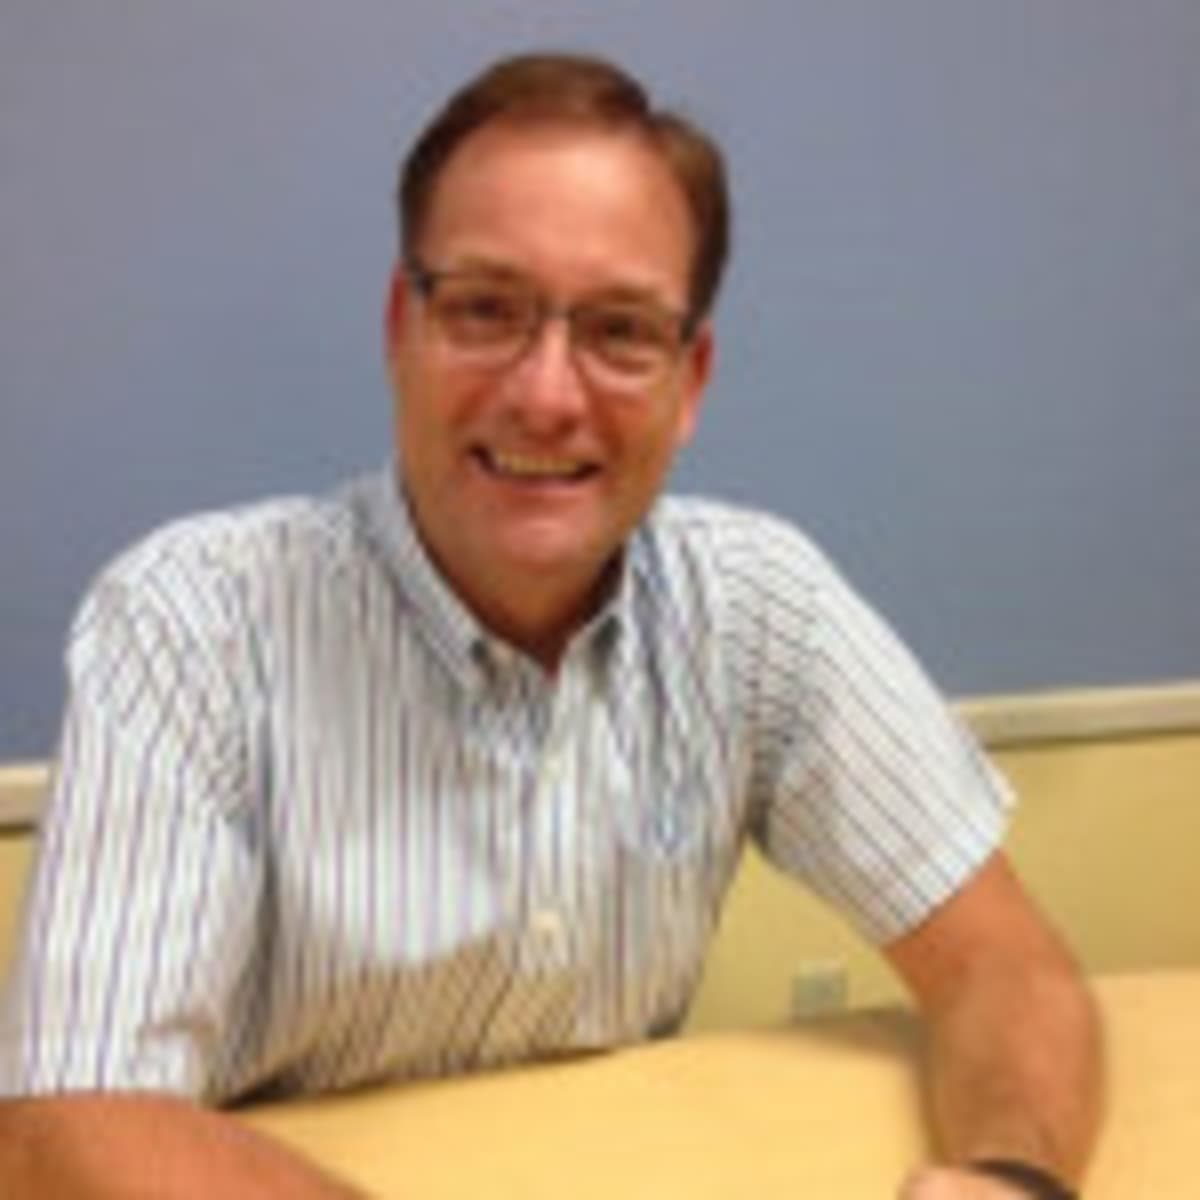 Philip Anschutz